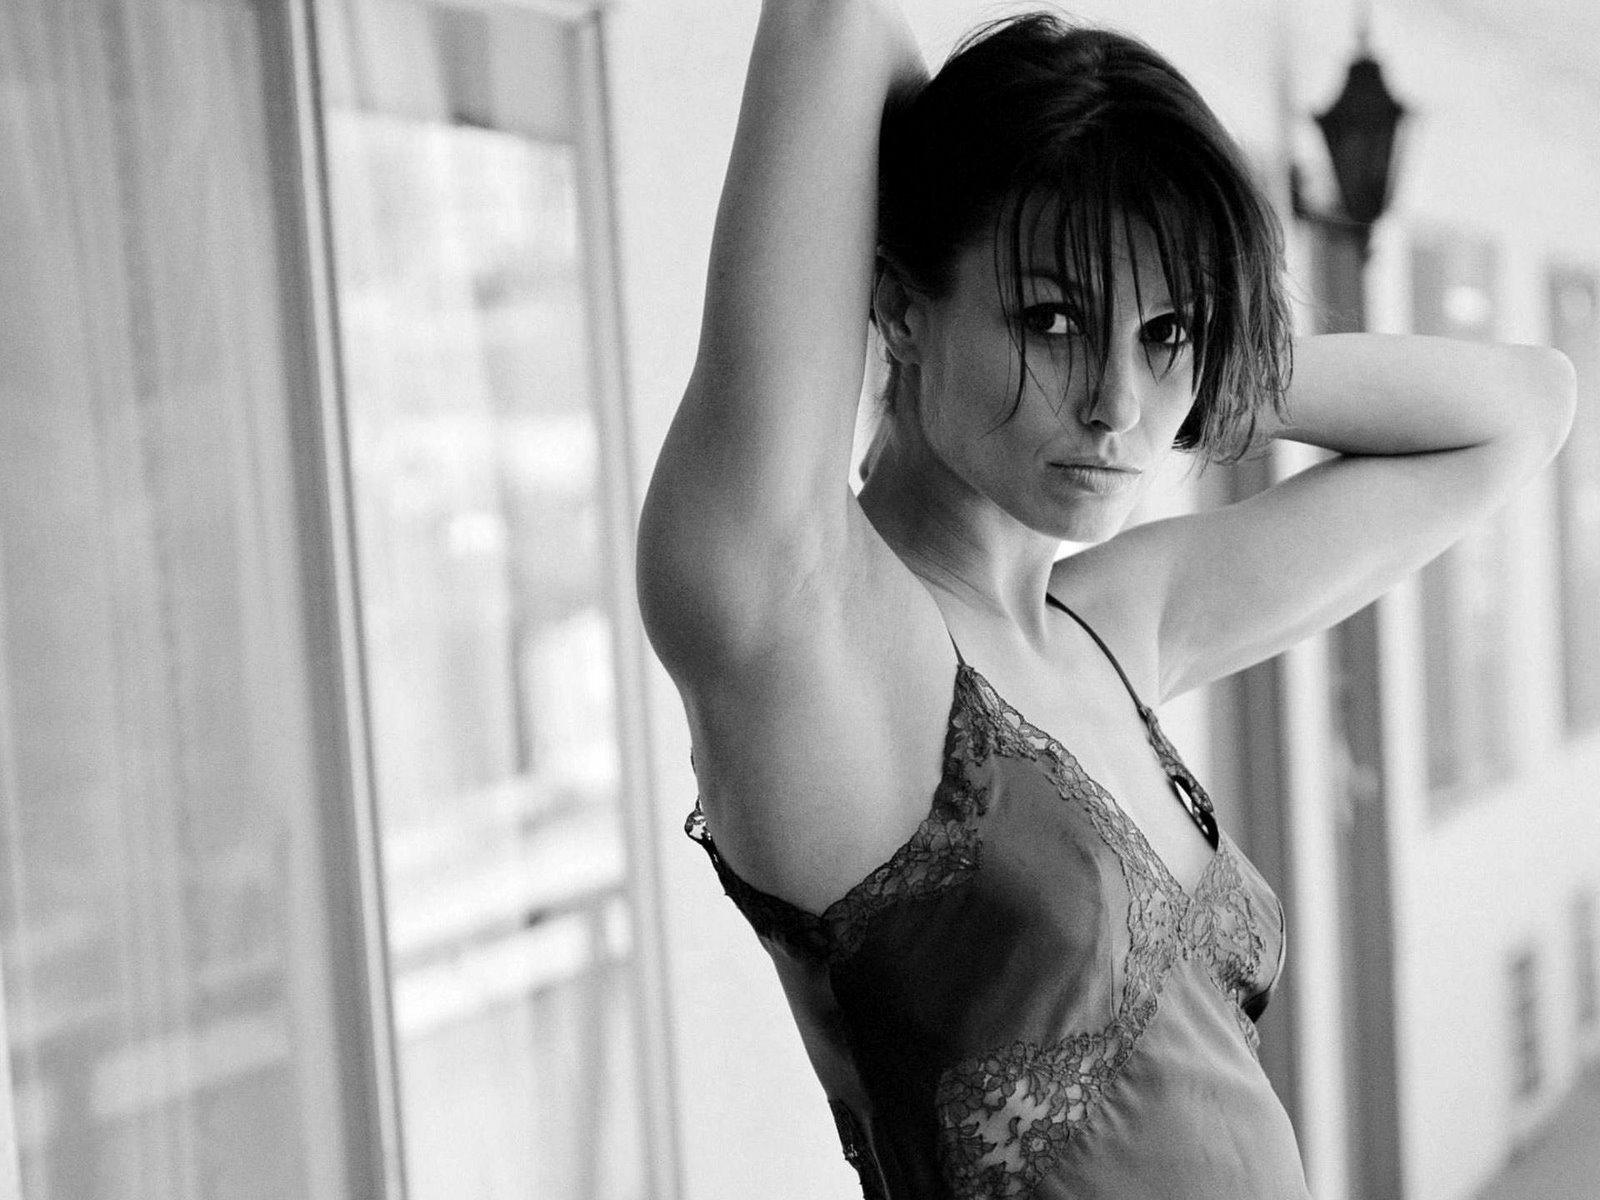 Bridget Moynahan Hot Pictures  Bikini Sexy Photoshoot  Girls Wallpapers  Movie DVD Music Reviews